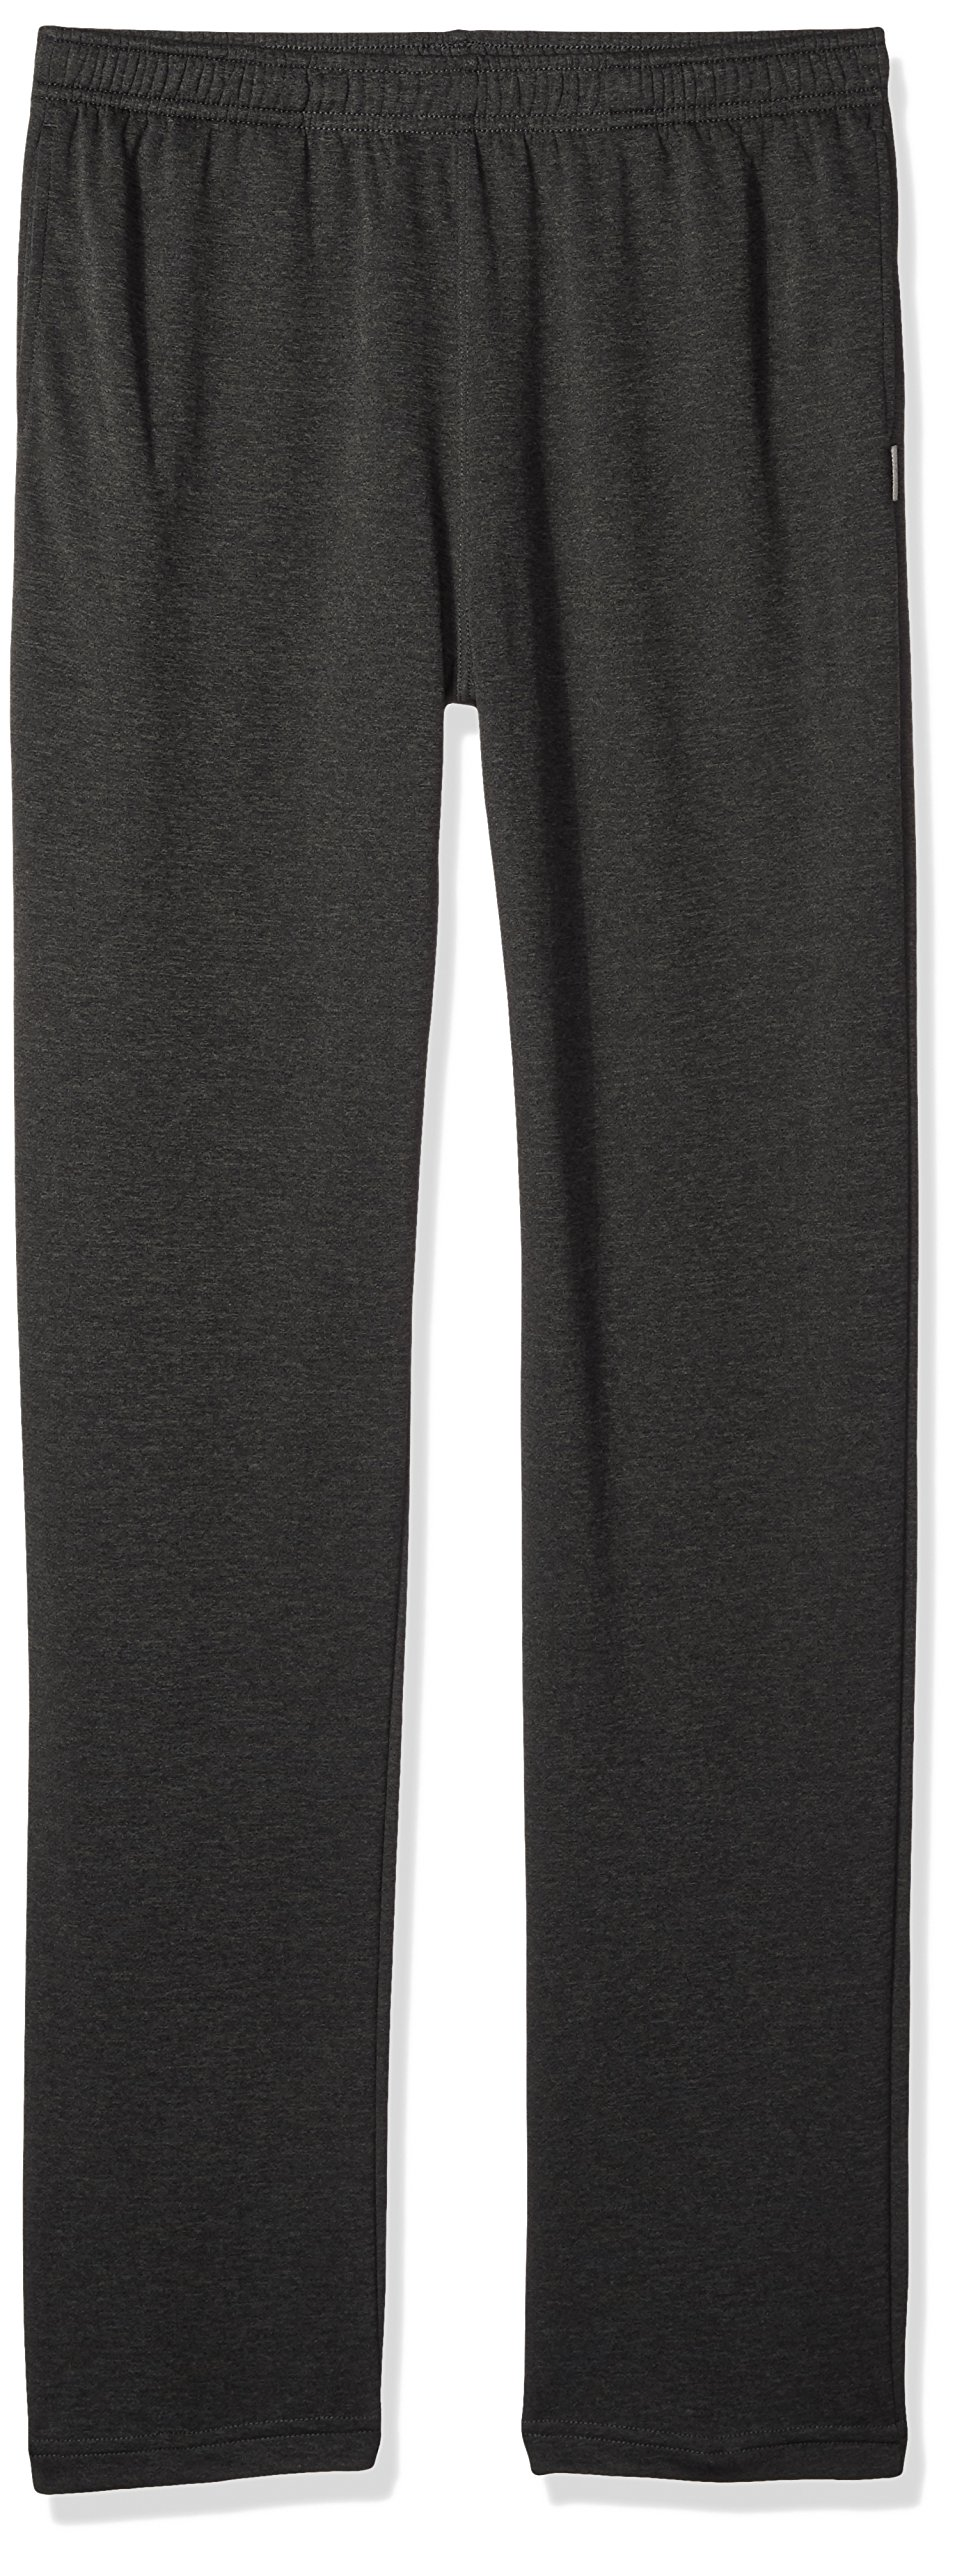 White Sierra Boys Bug Free Campfire Pants, Black, X-Large